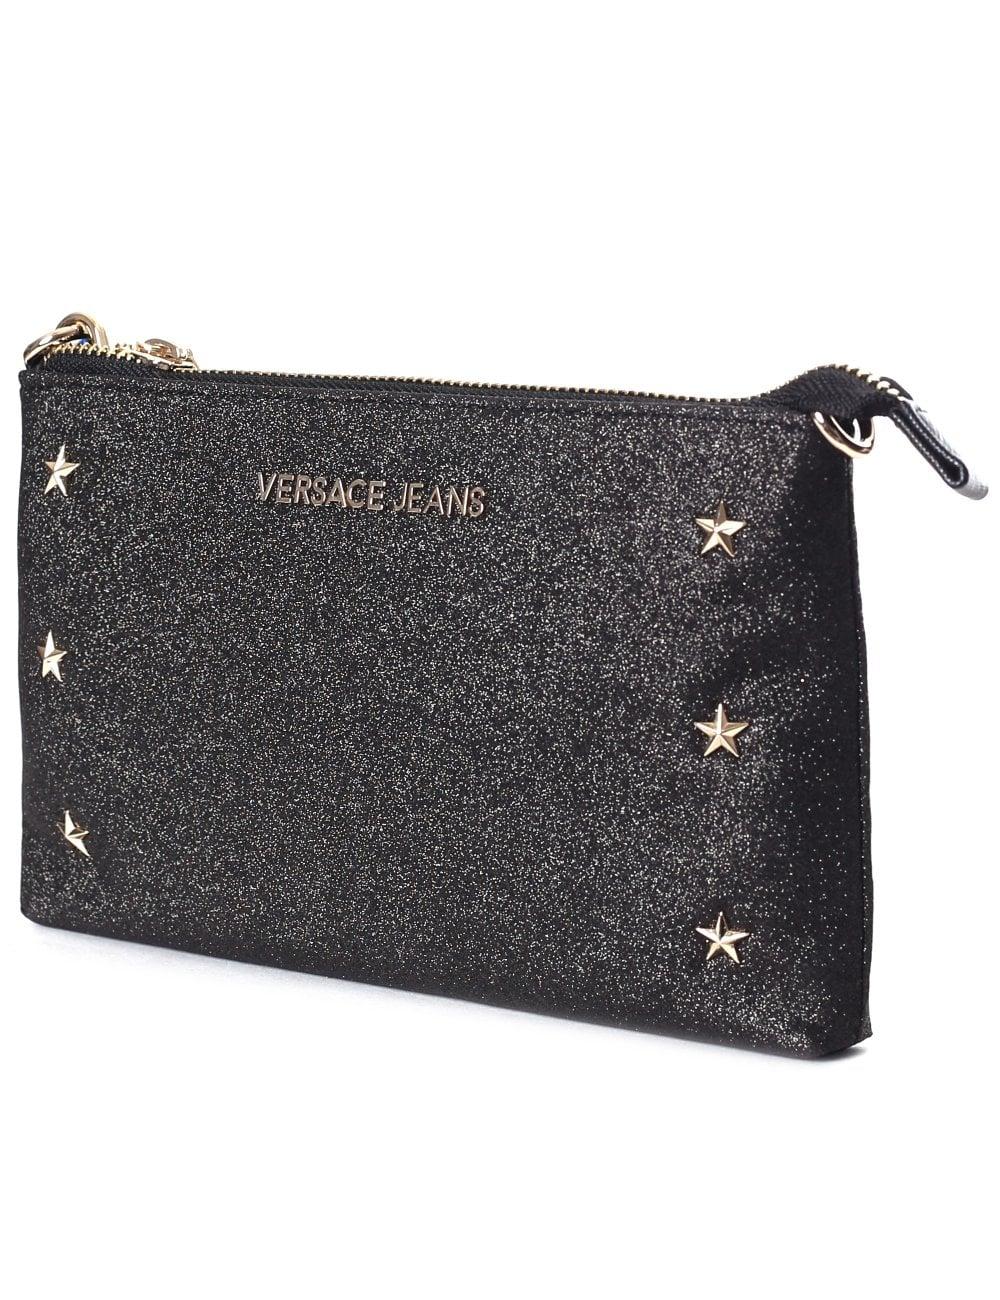 Versace Jeans Women s Glitter Star Small Crossbody Bag ee84284cc8e15